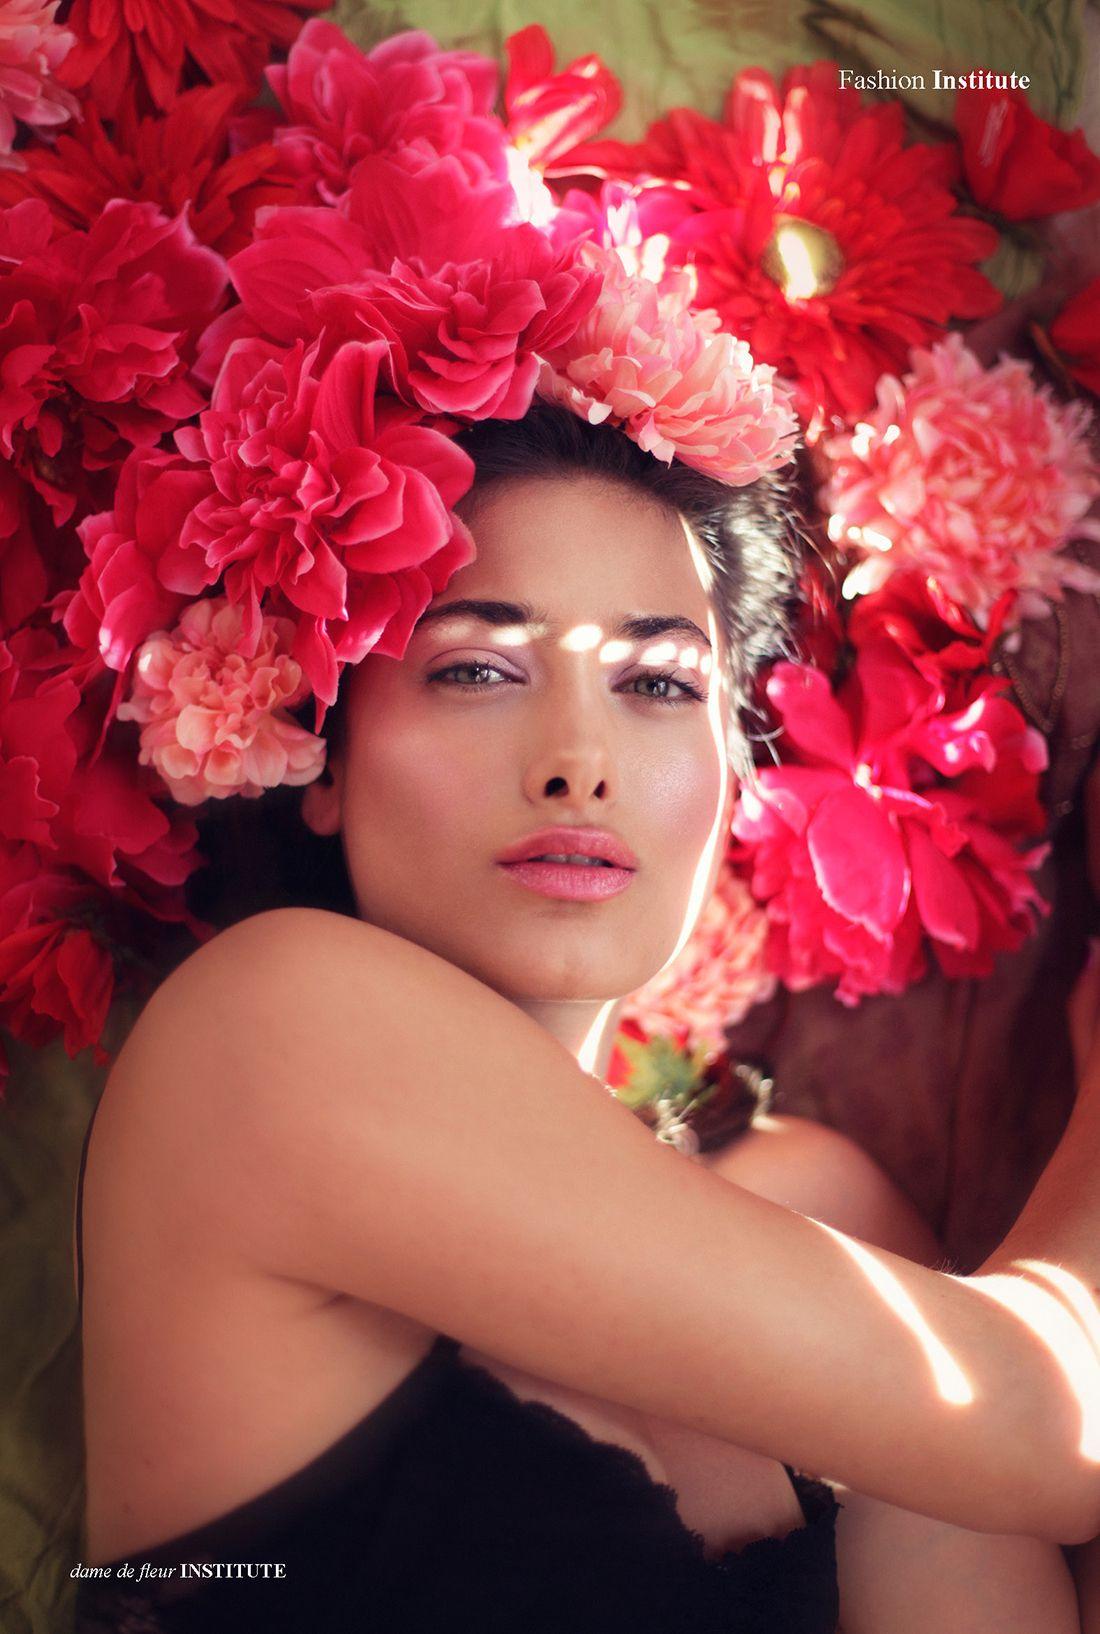 Epingle Sur Beauty Fashion Photography